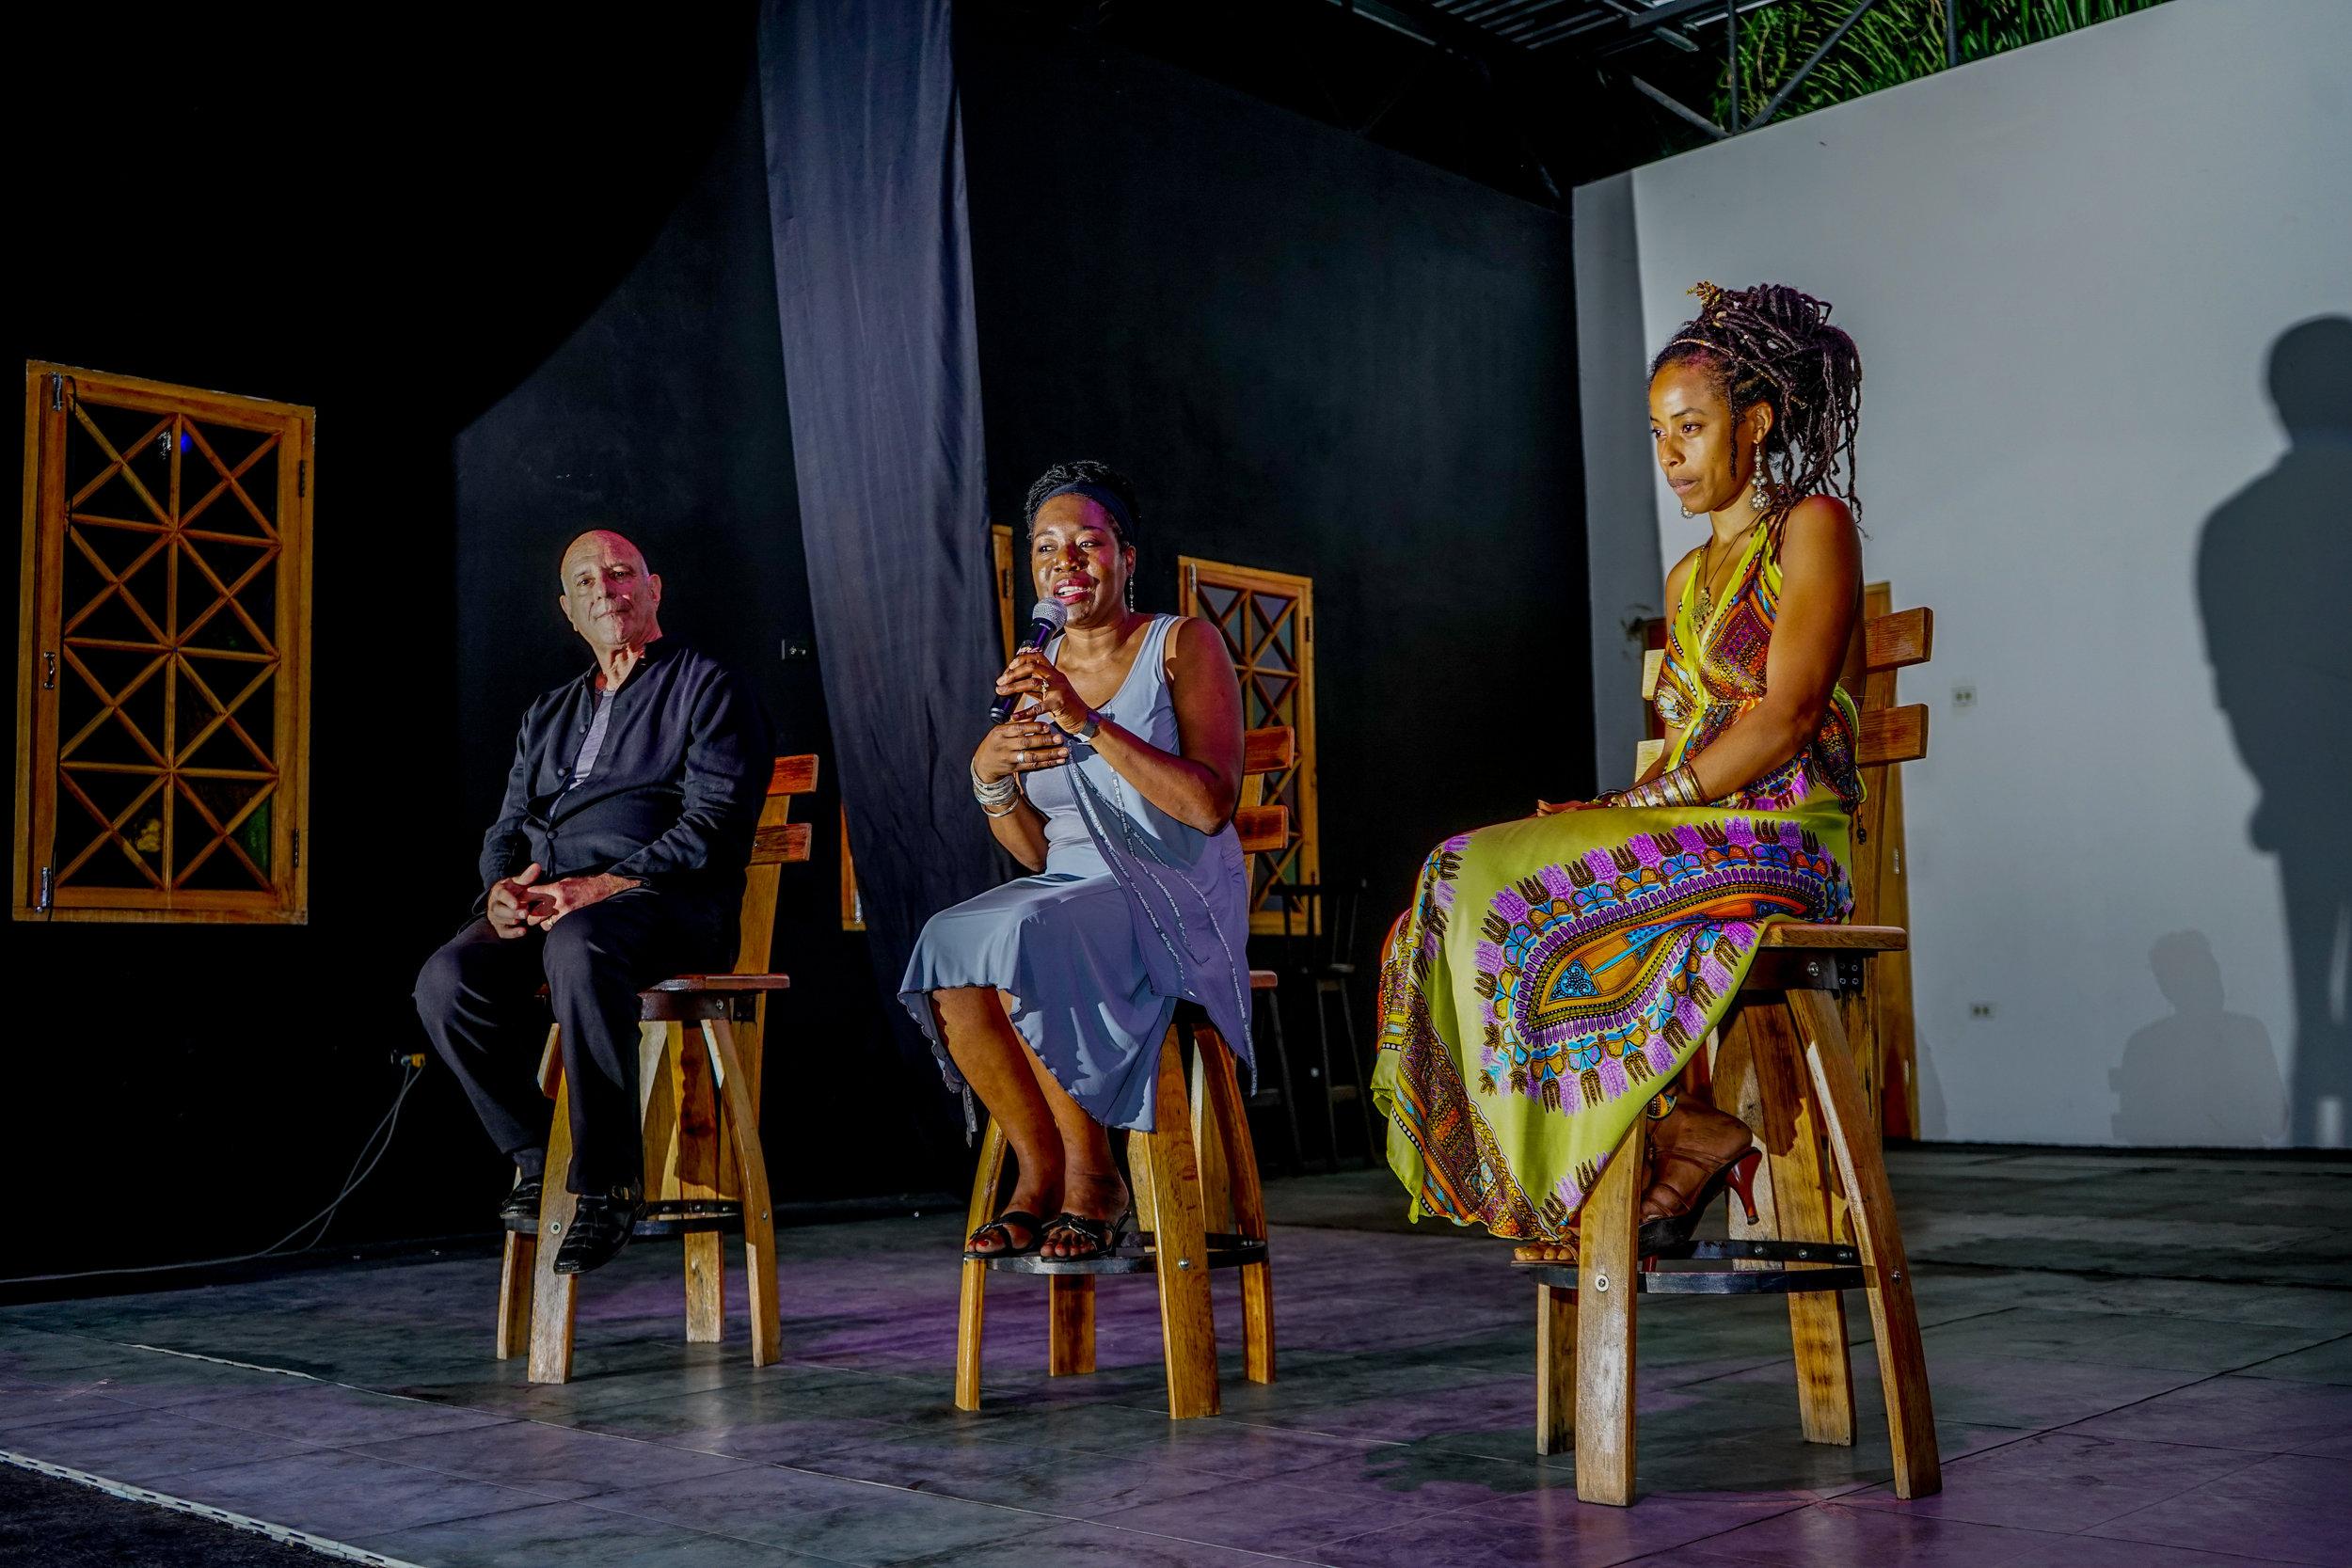 Pictured Left to Right:  Stuart Samuels Prod/Dir/Writer, Renee Robinson Jamaica Film Commissioner,   Donisha Prendergast, Star of film & Actor/Public Speaker/Filmmaker/Partner DSE Jamaica